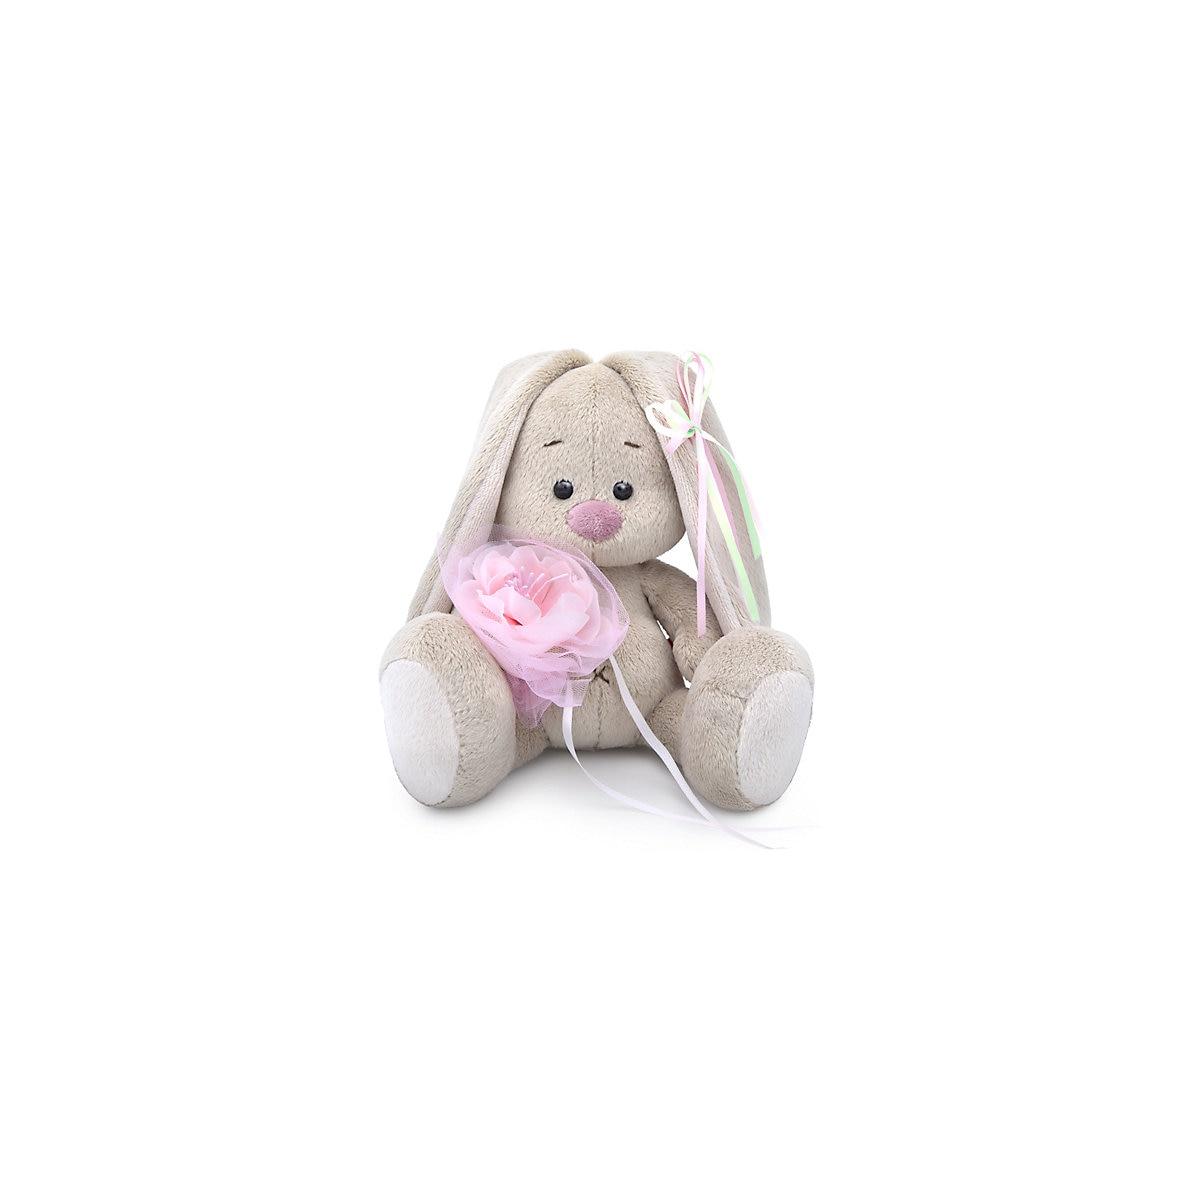 BUDI BASA Stuffed & Plush Animals 10884001 Children Toys Fluffy Pets Game Classic Toy